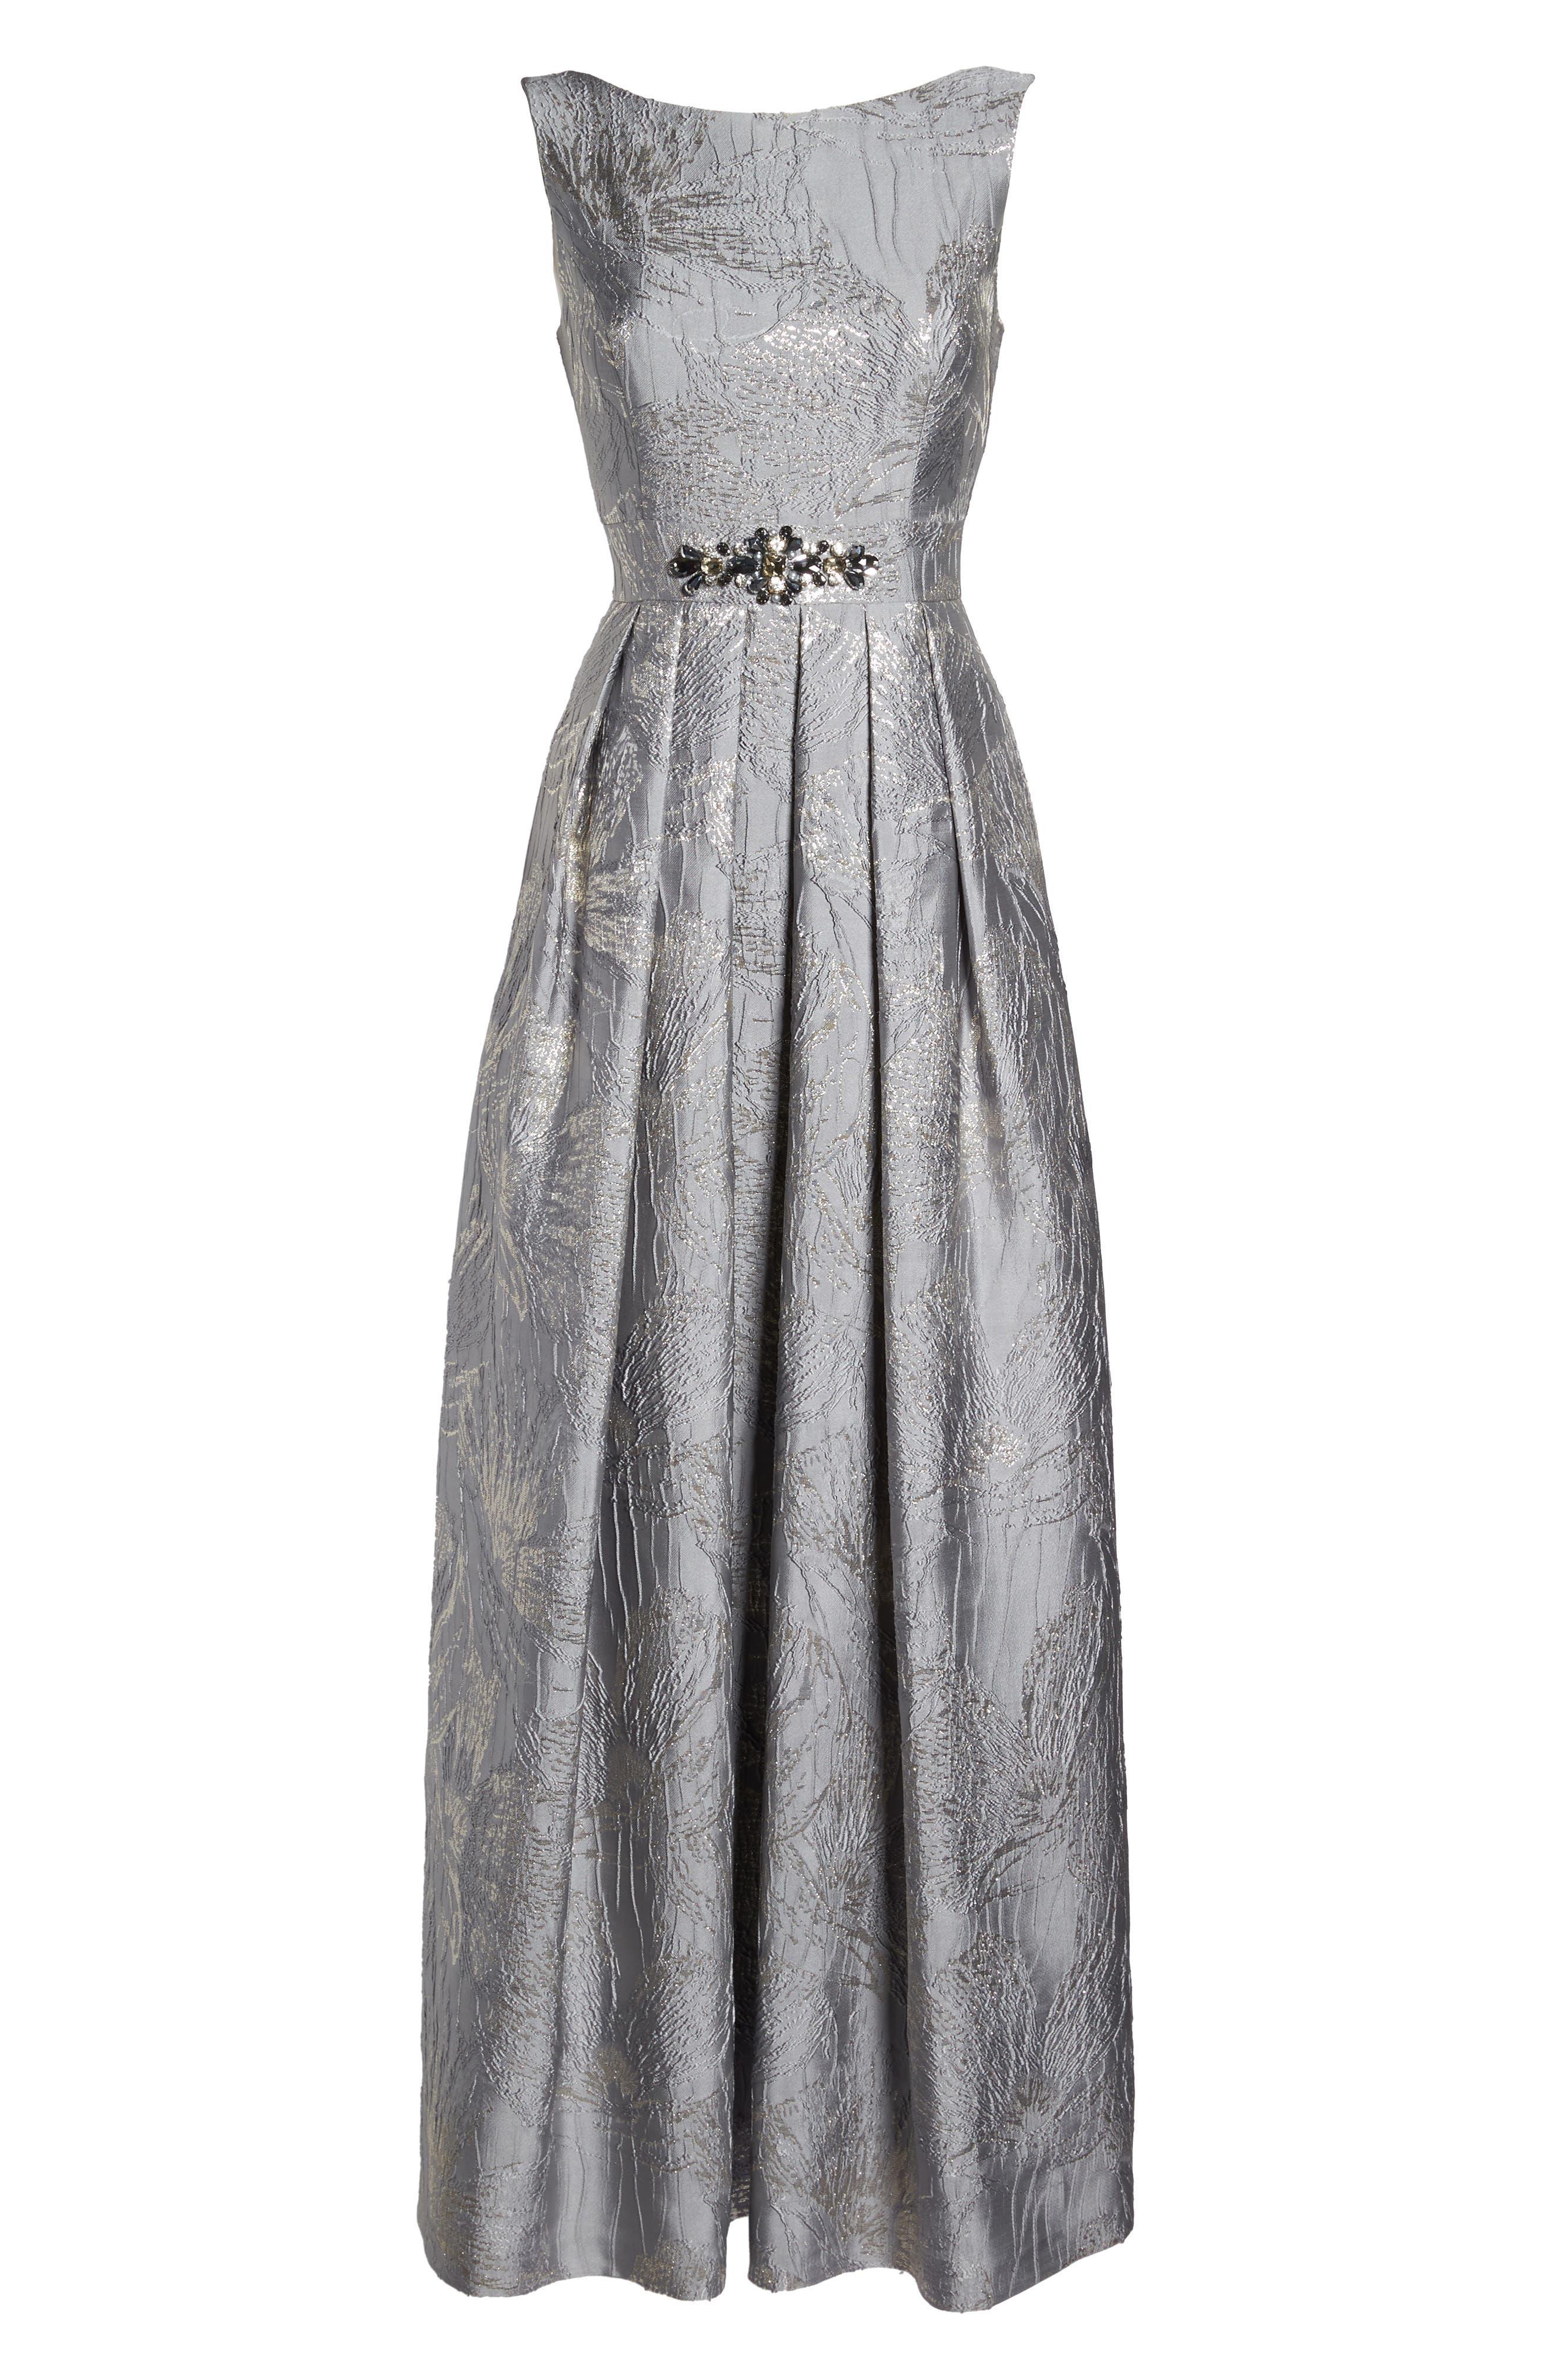 Embellished Brocade Ballgown,                             Alternate thumbnail 6, color,                             040